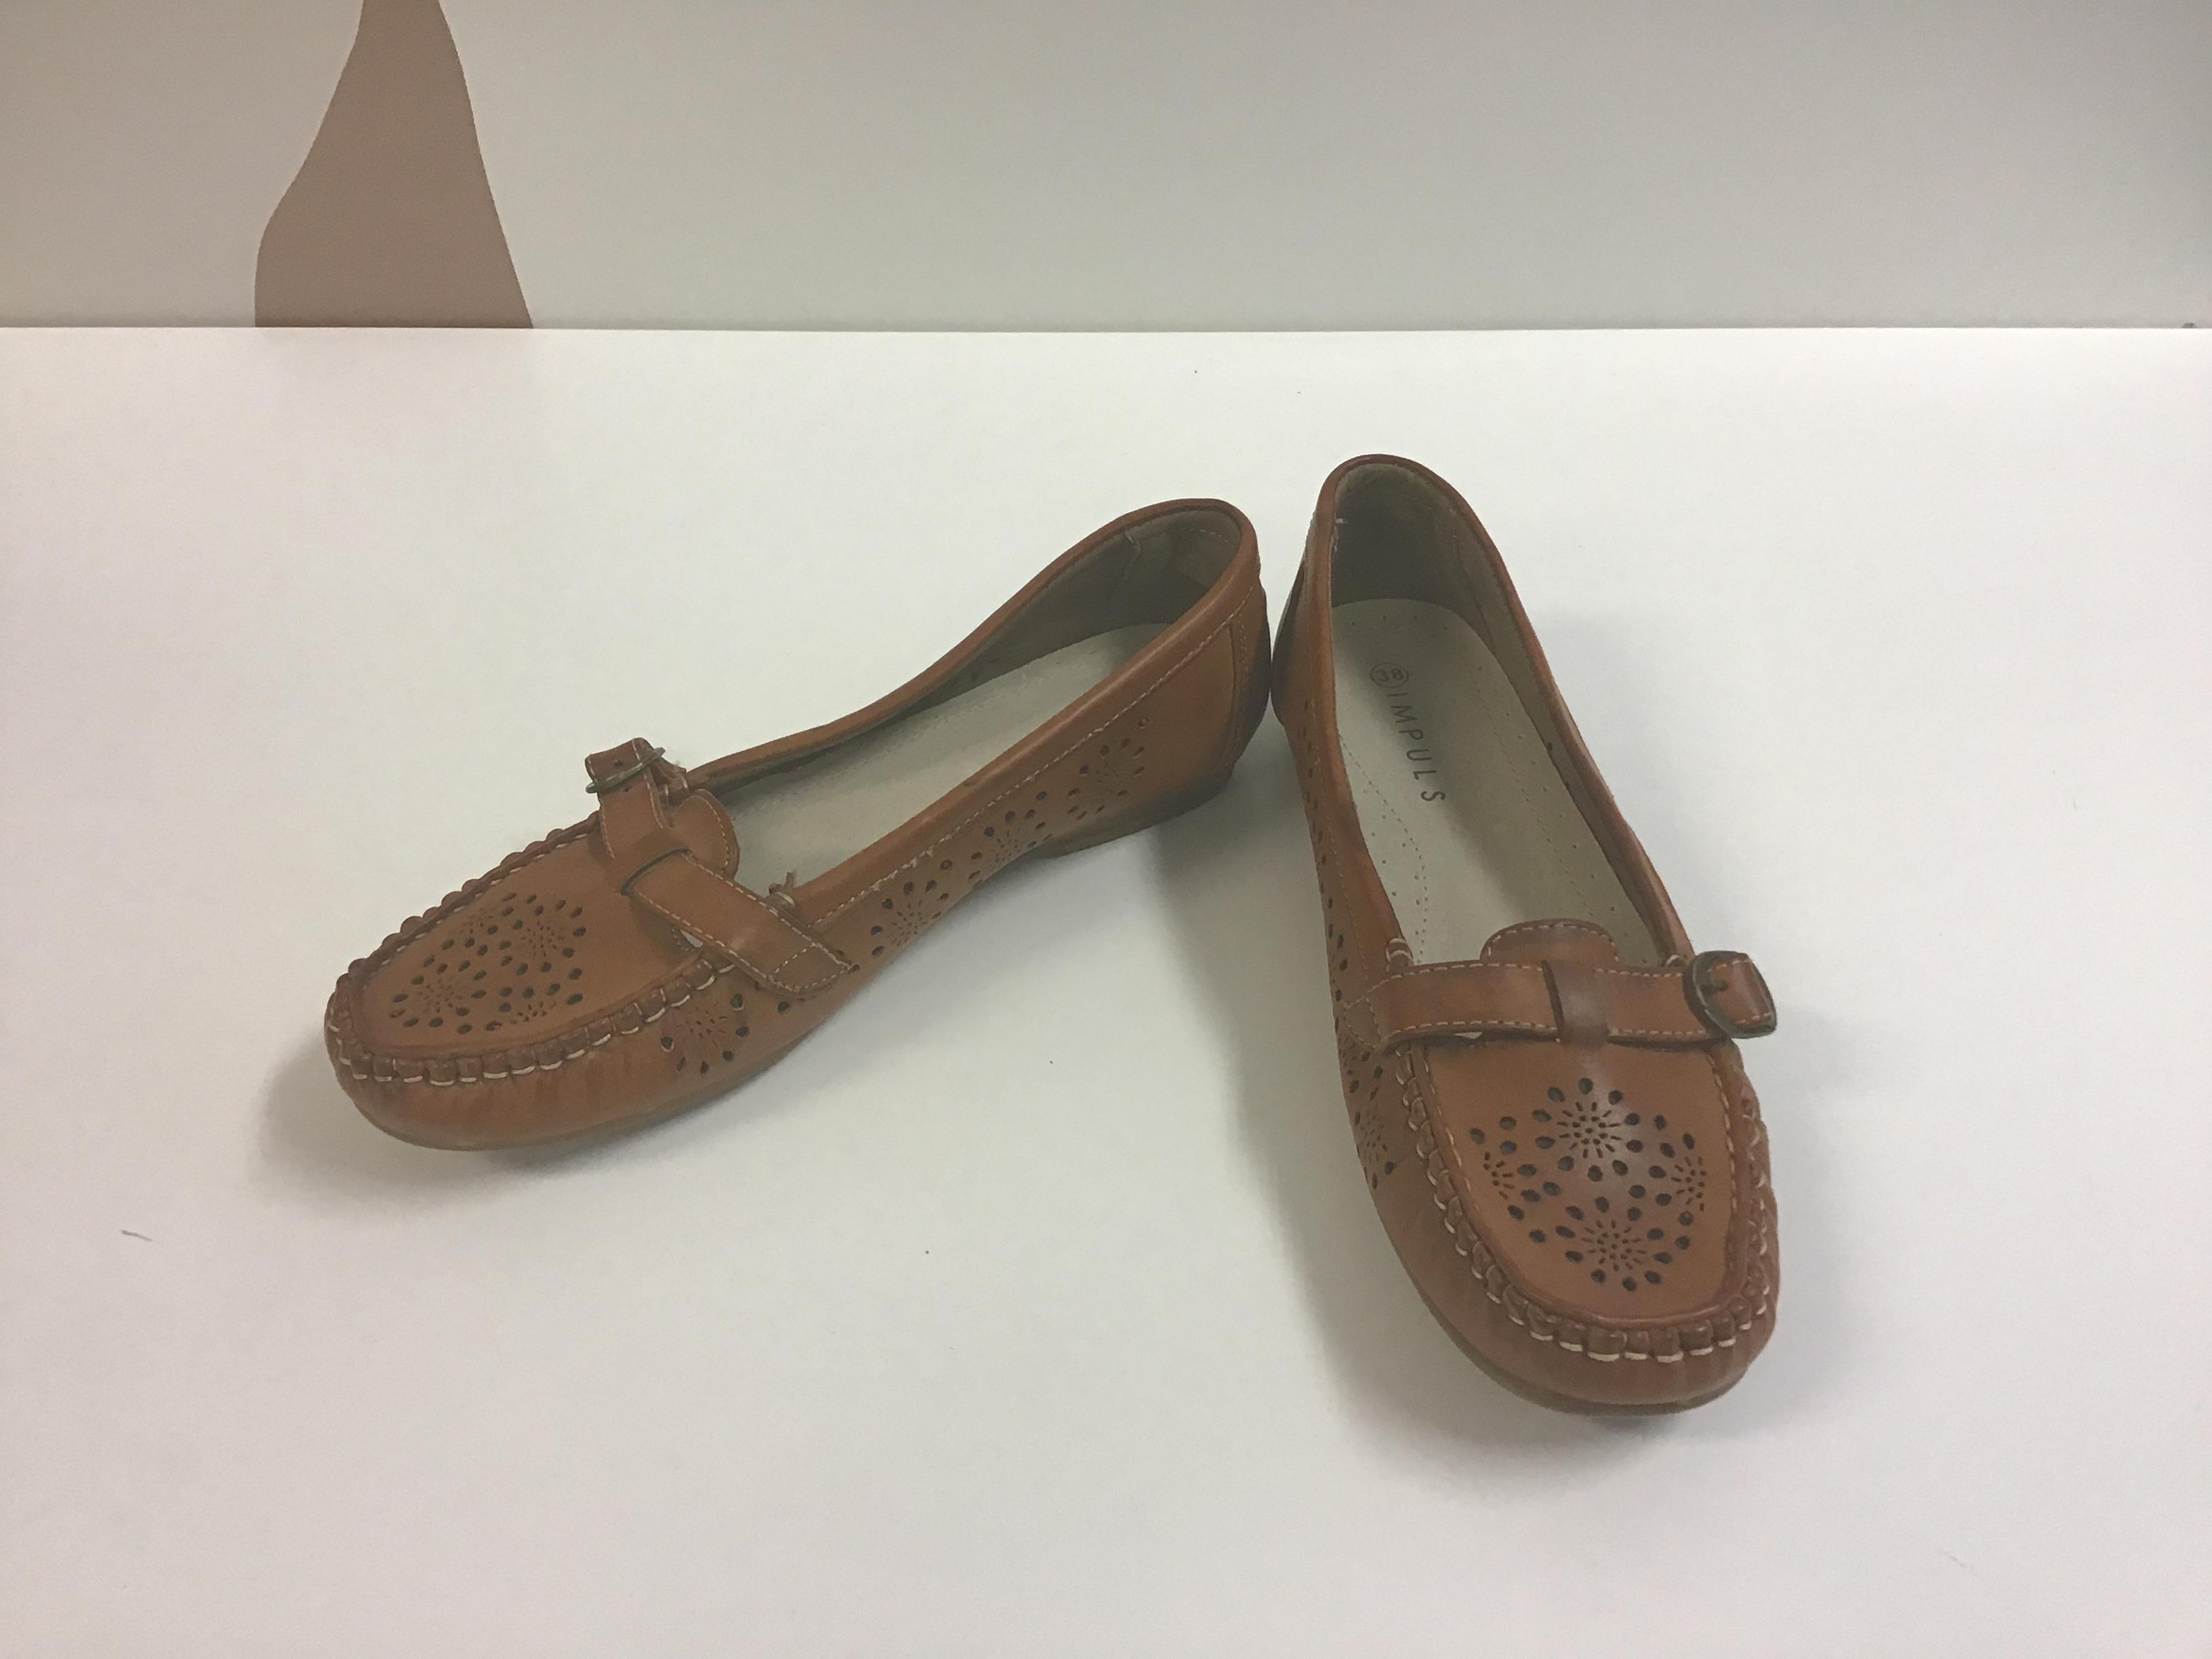 Kengät, koko 38, uudet